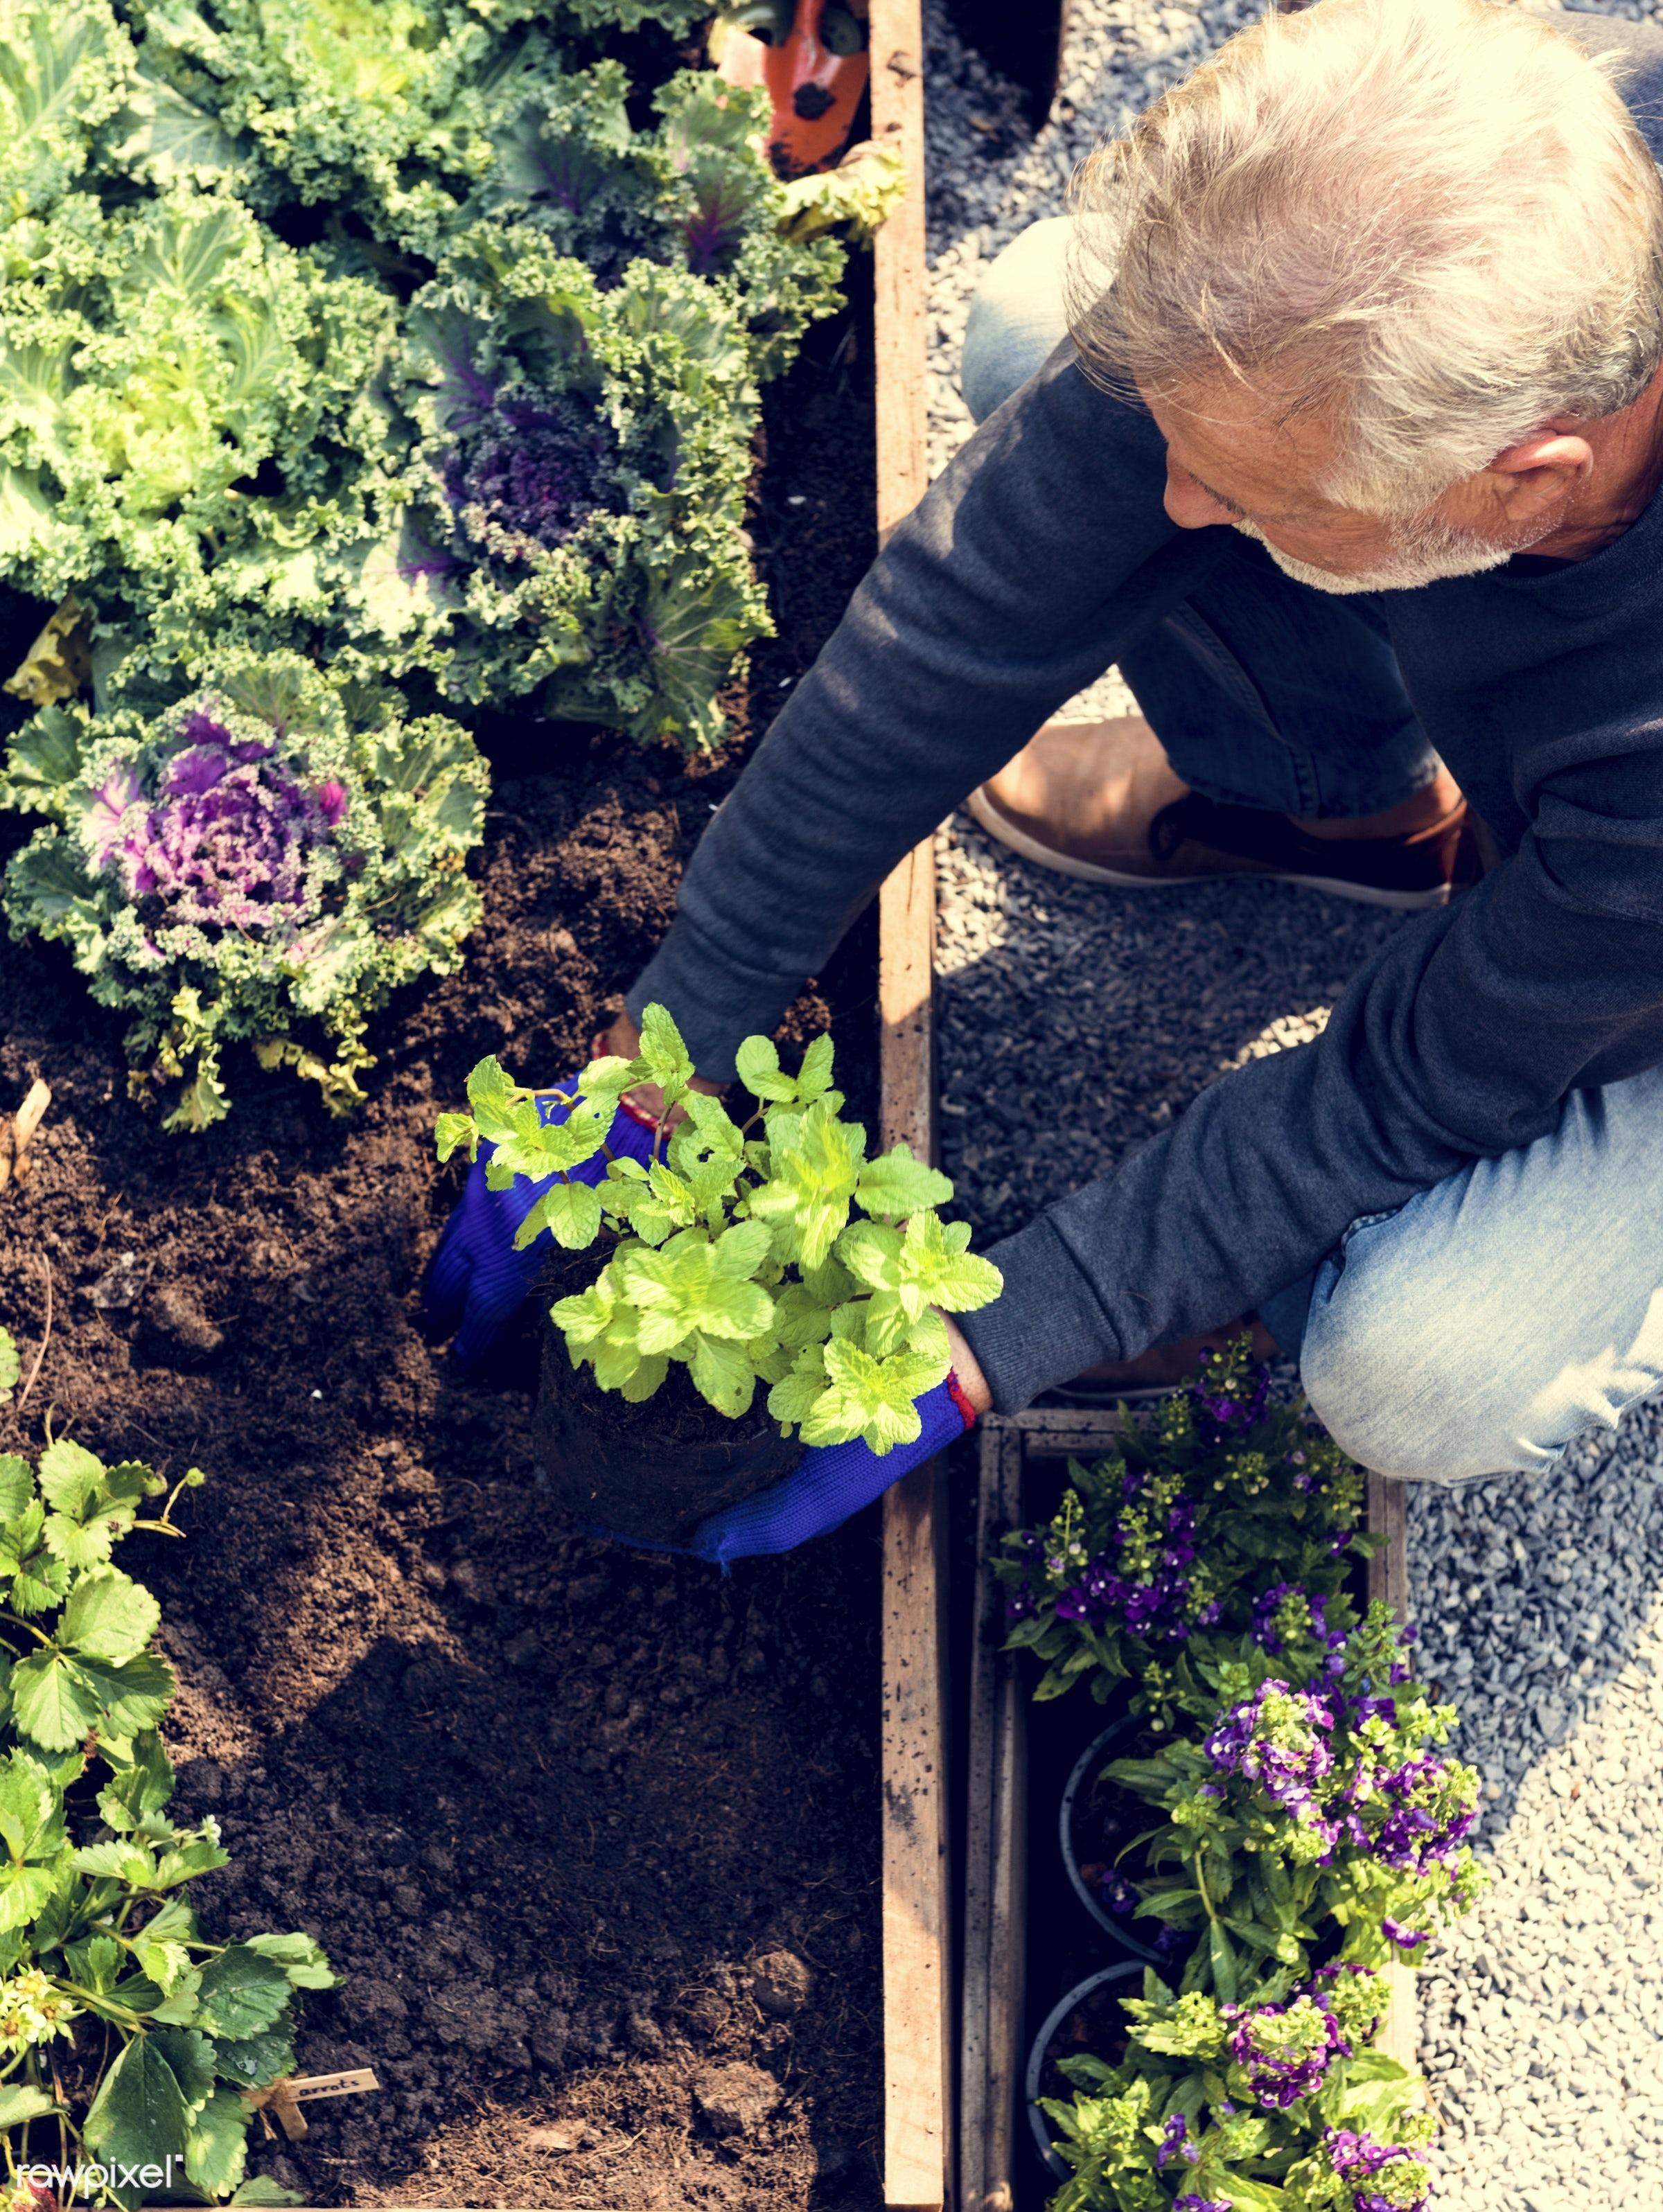 countryside, person, greenhouse, botanical, plantation, caucasian, retirement, tree, farmer, nature, lifestyle, backyard,...